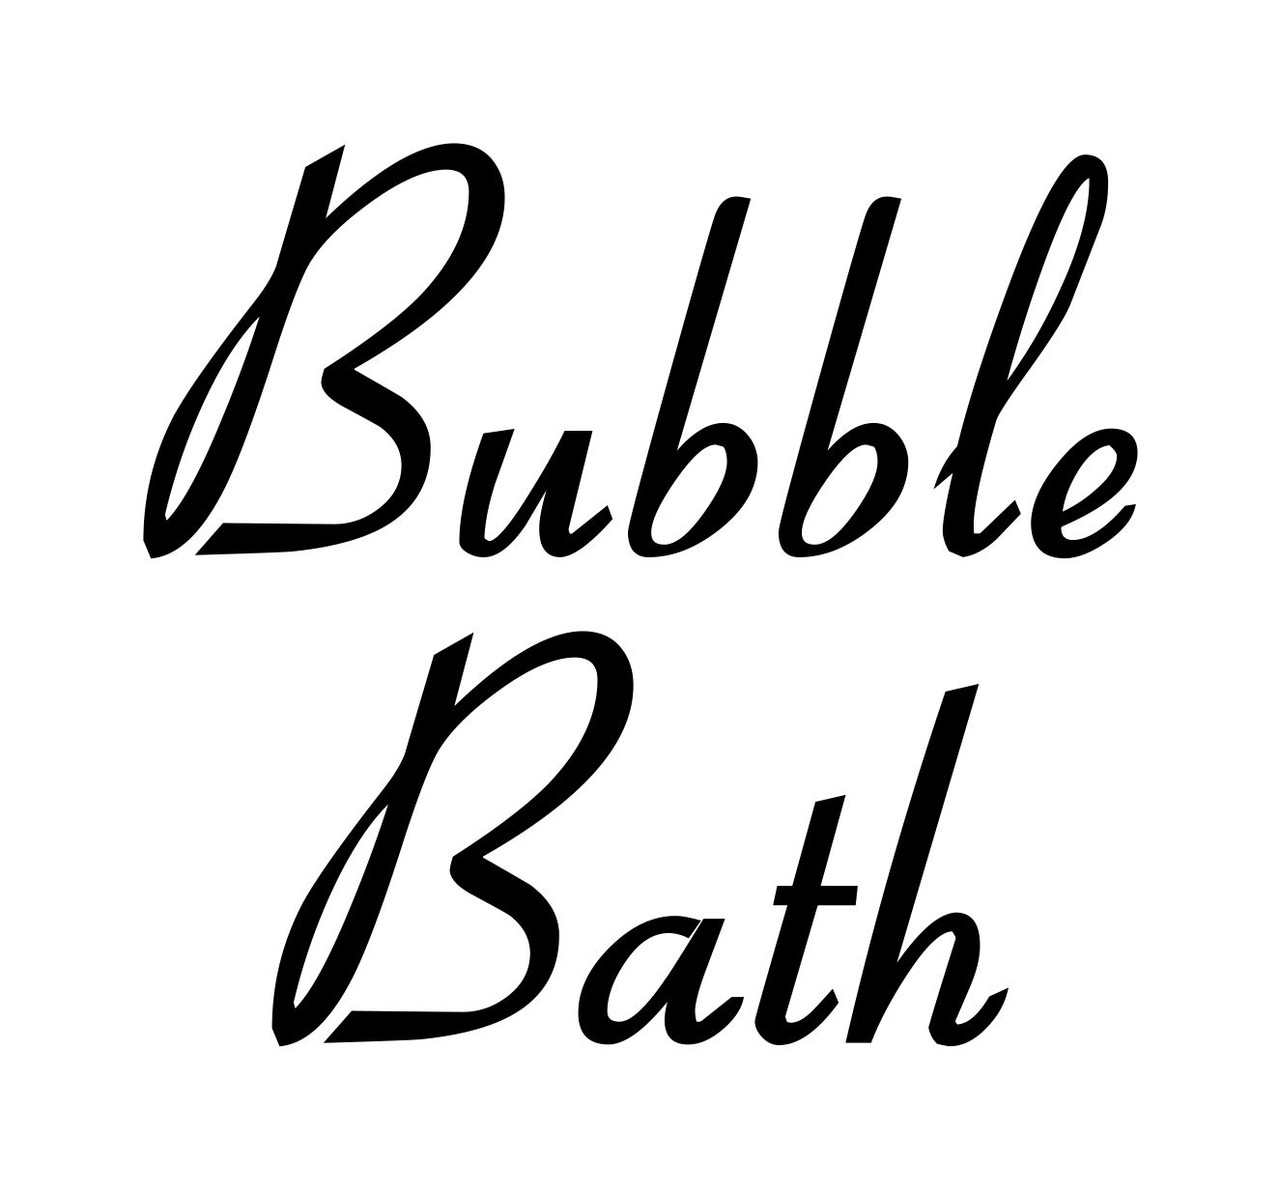 Bathroom Organization Labels Vinyl Stickers - Home Restroom - Die Cut Decals - Retro